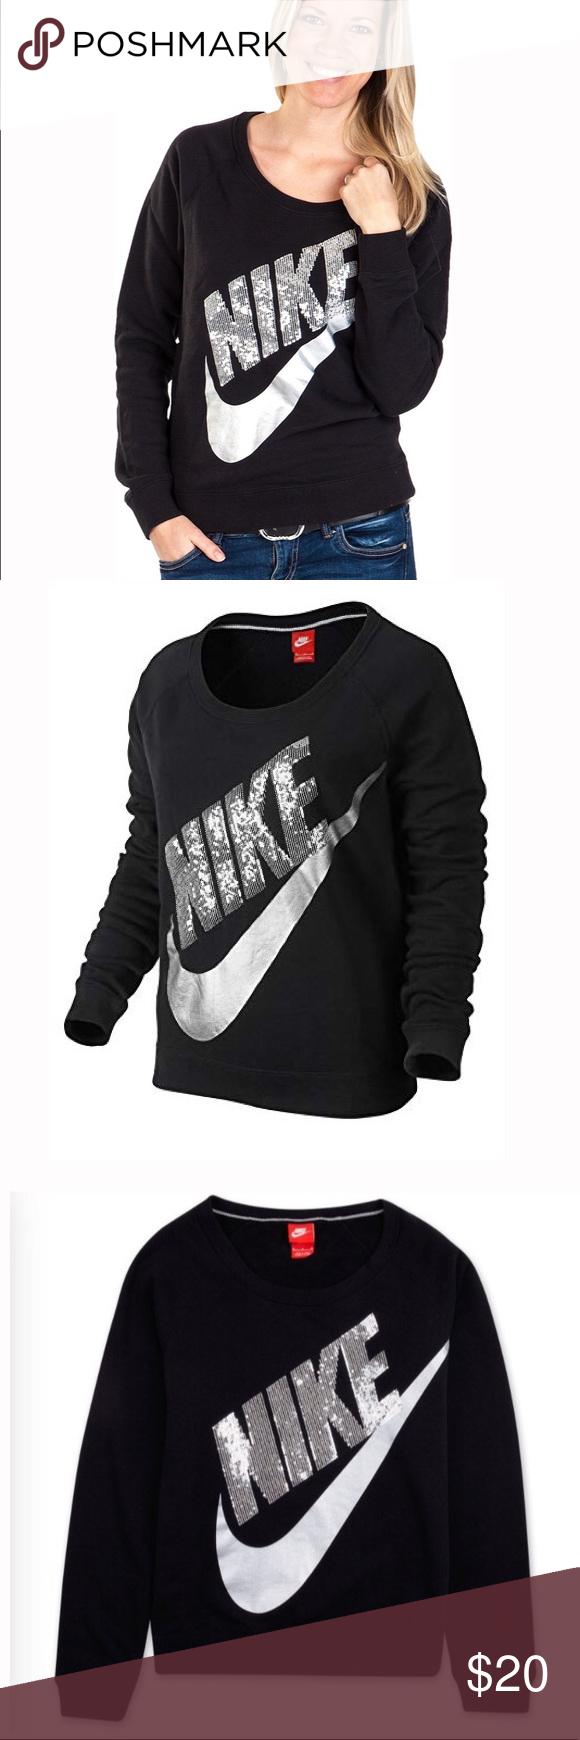 677977b27d4a NIKE RALLY CREW SEQUIN SWEATSHIRT 🔻Women´s sweater Nike RALLY CREW-SEQUIN  made